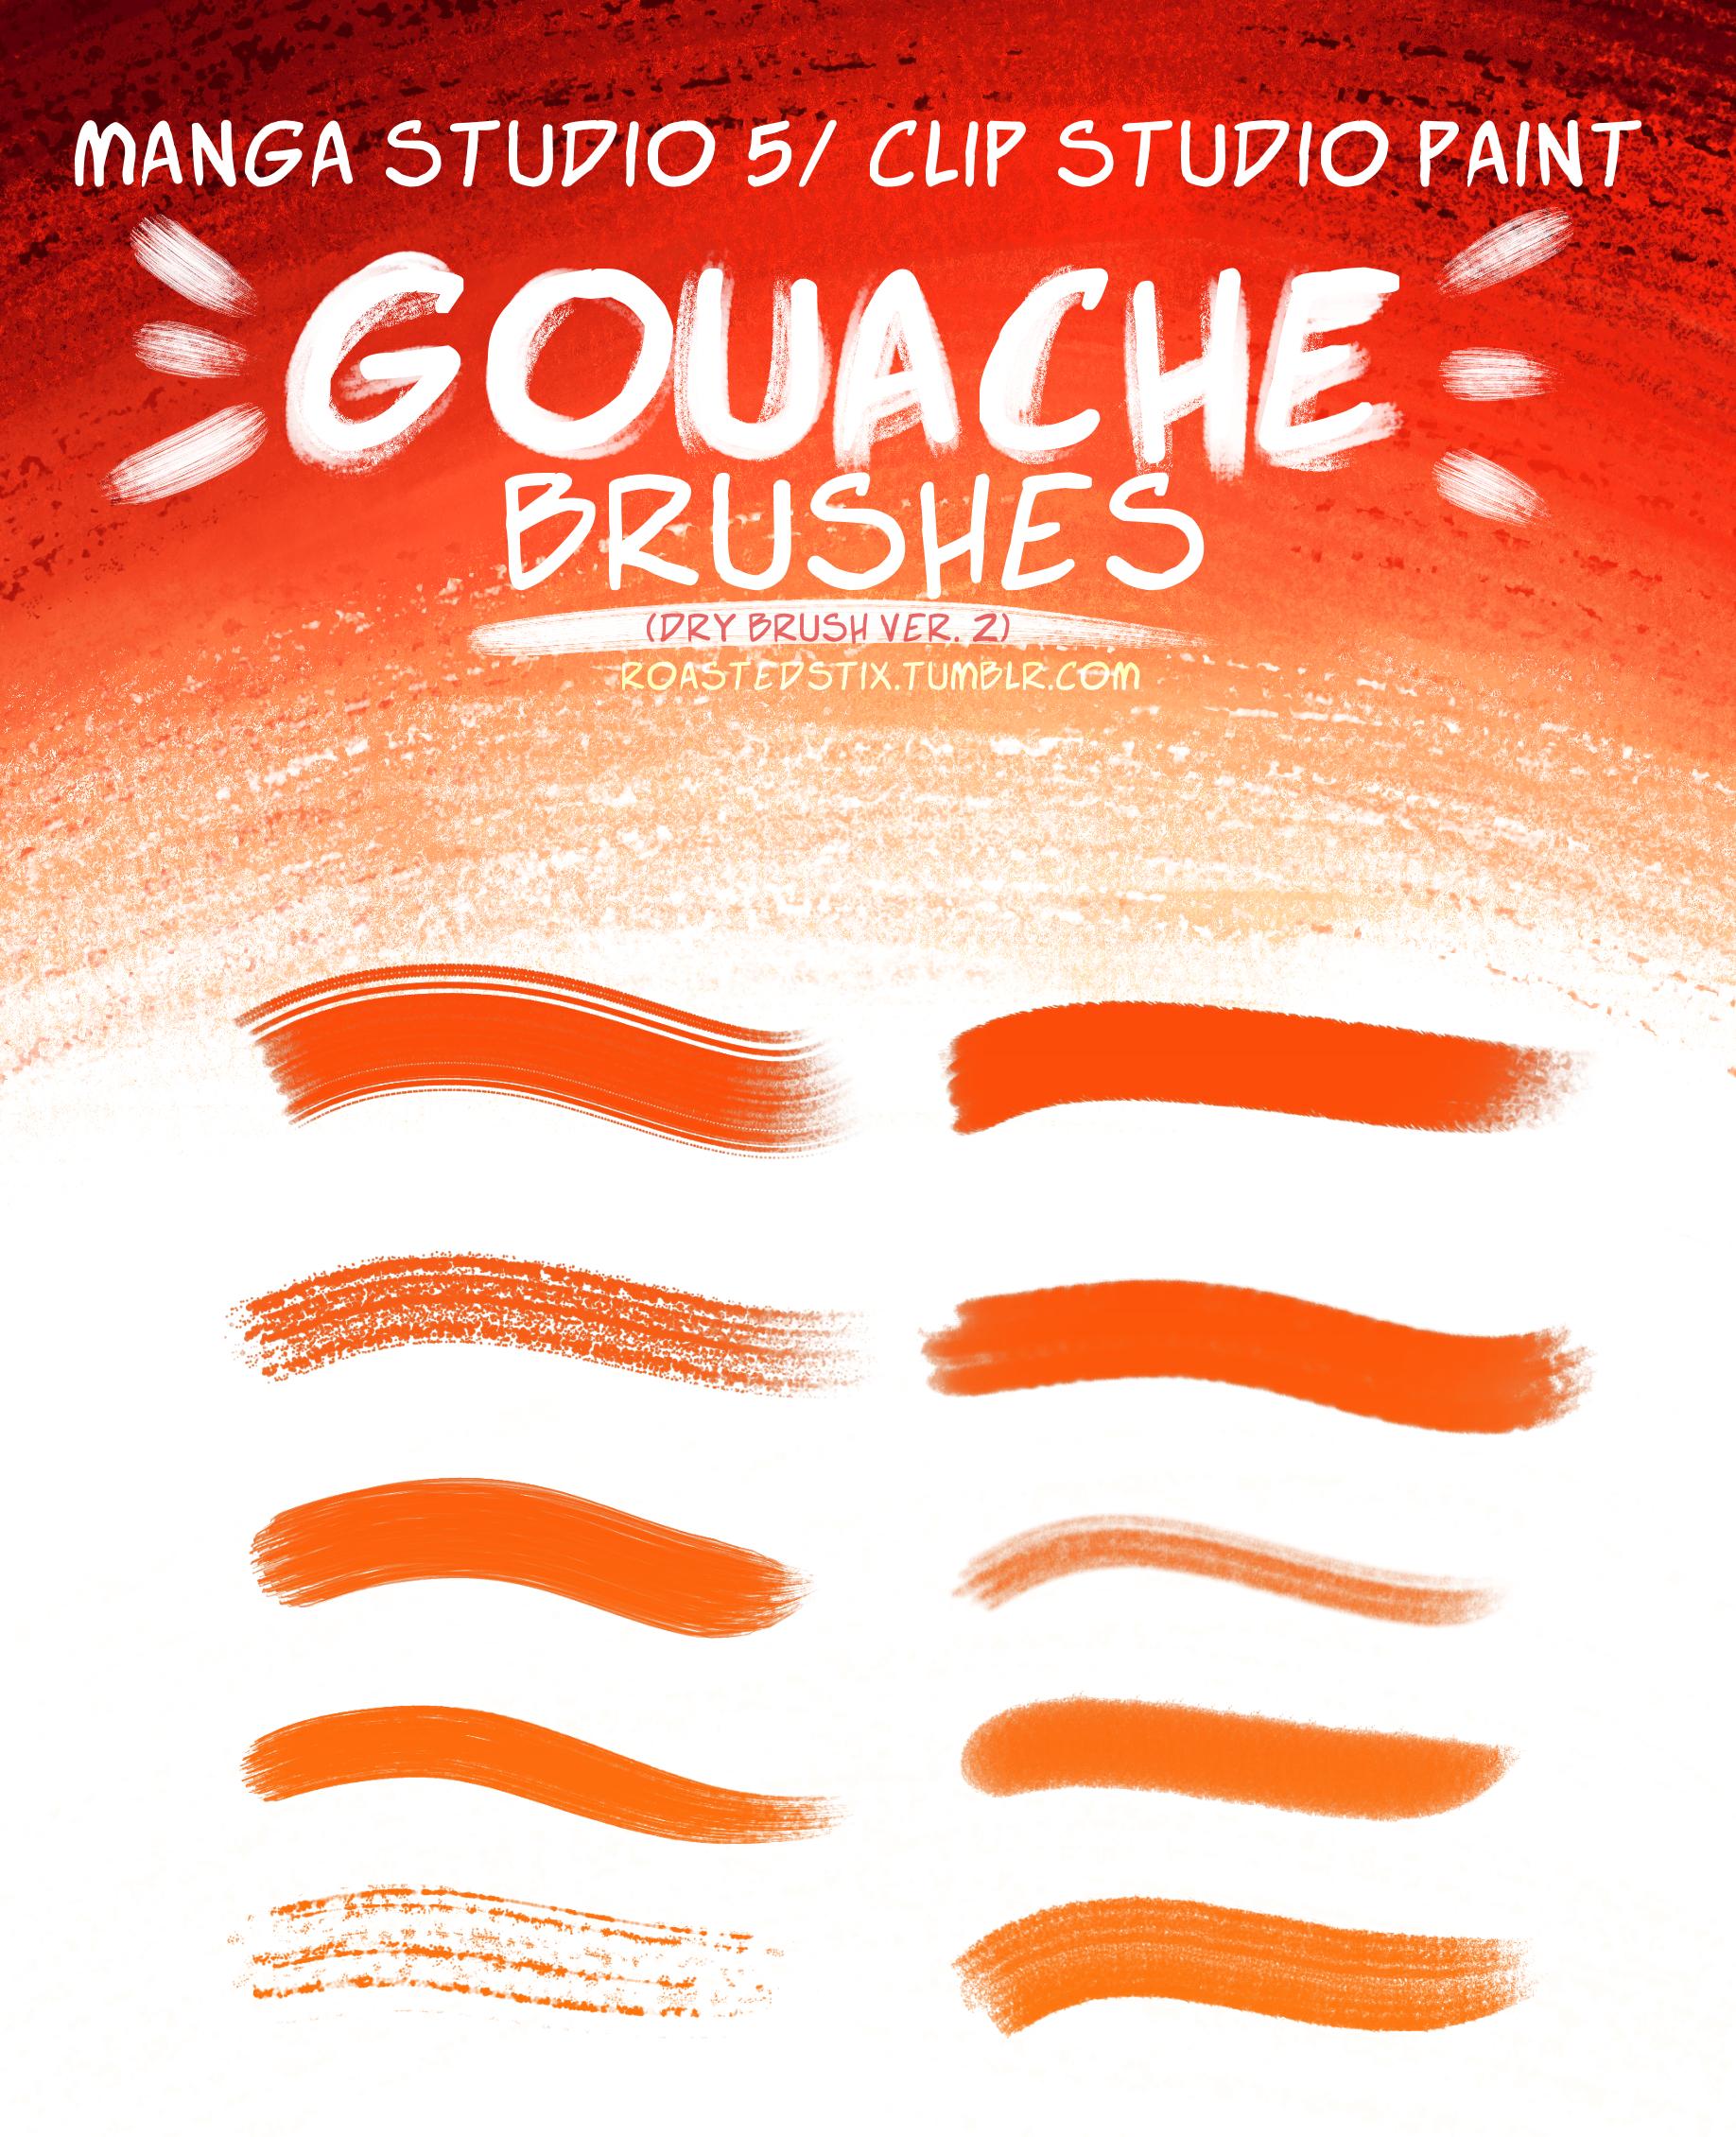 Gouache Brush Set for Manga Studio (Dry Brysh v.2) by RoastedStix